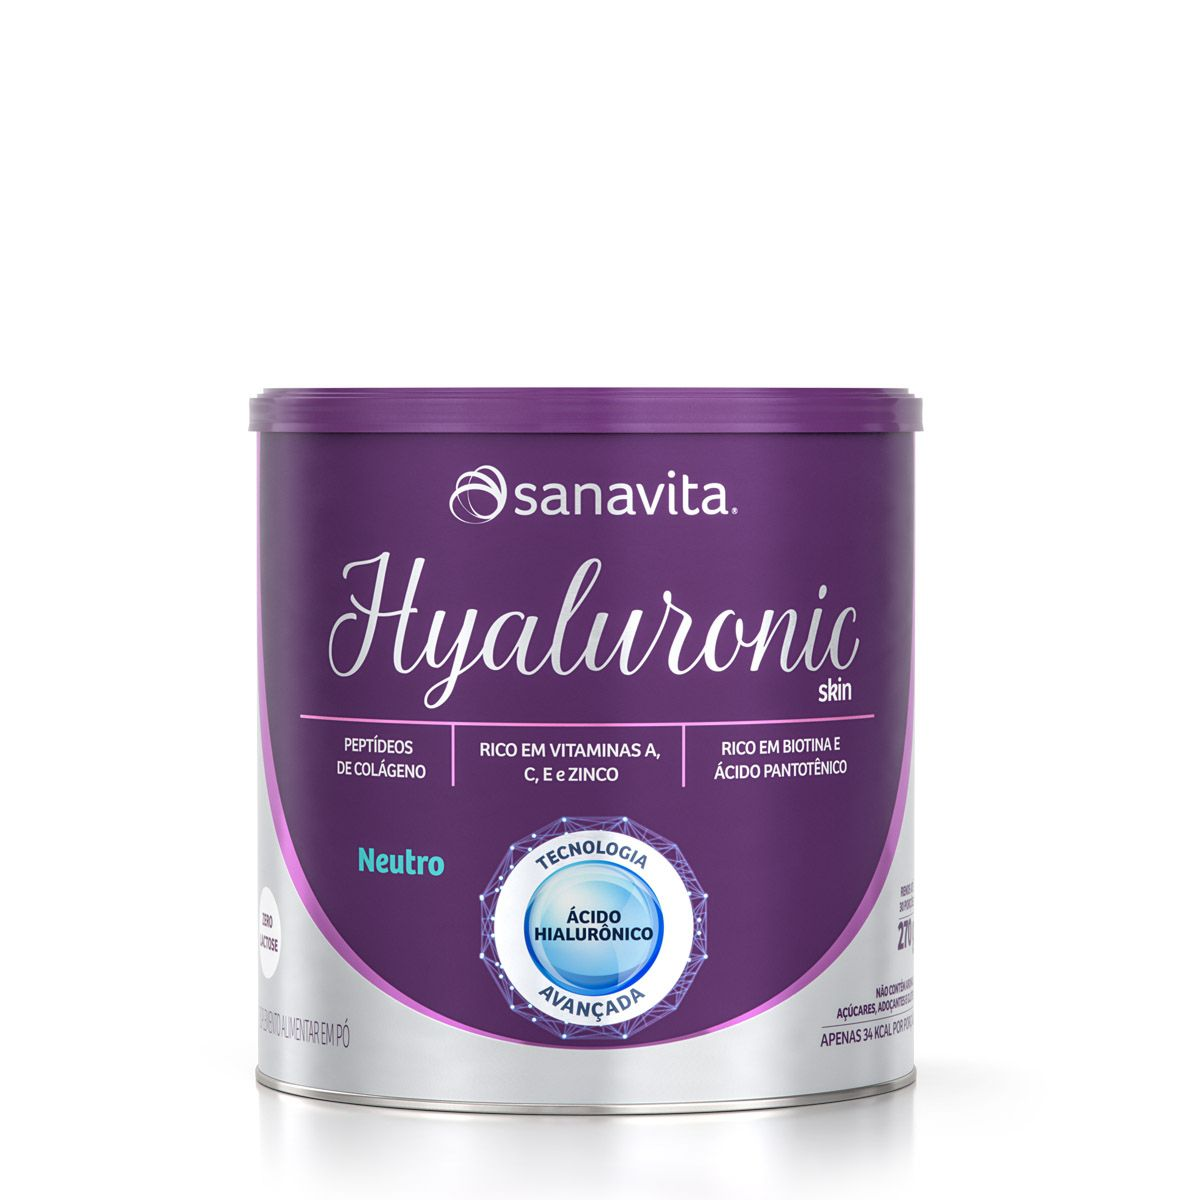 HYALURONIC SKIN NEUTRO 270g - Sanavita